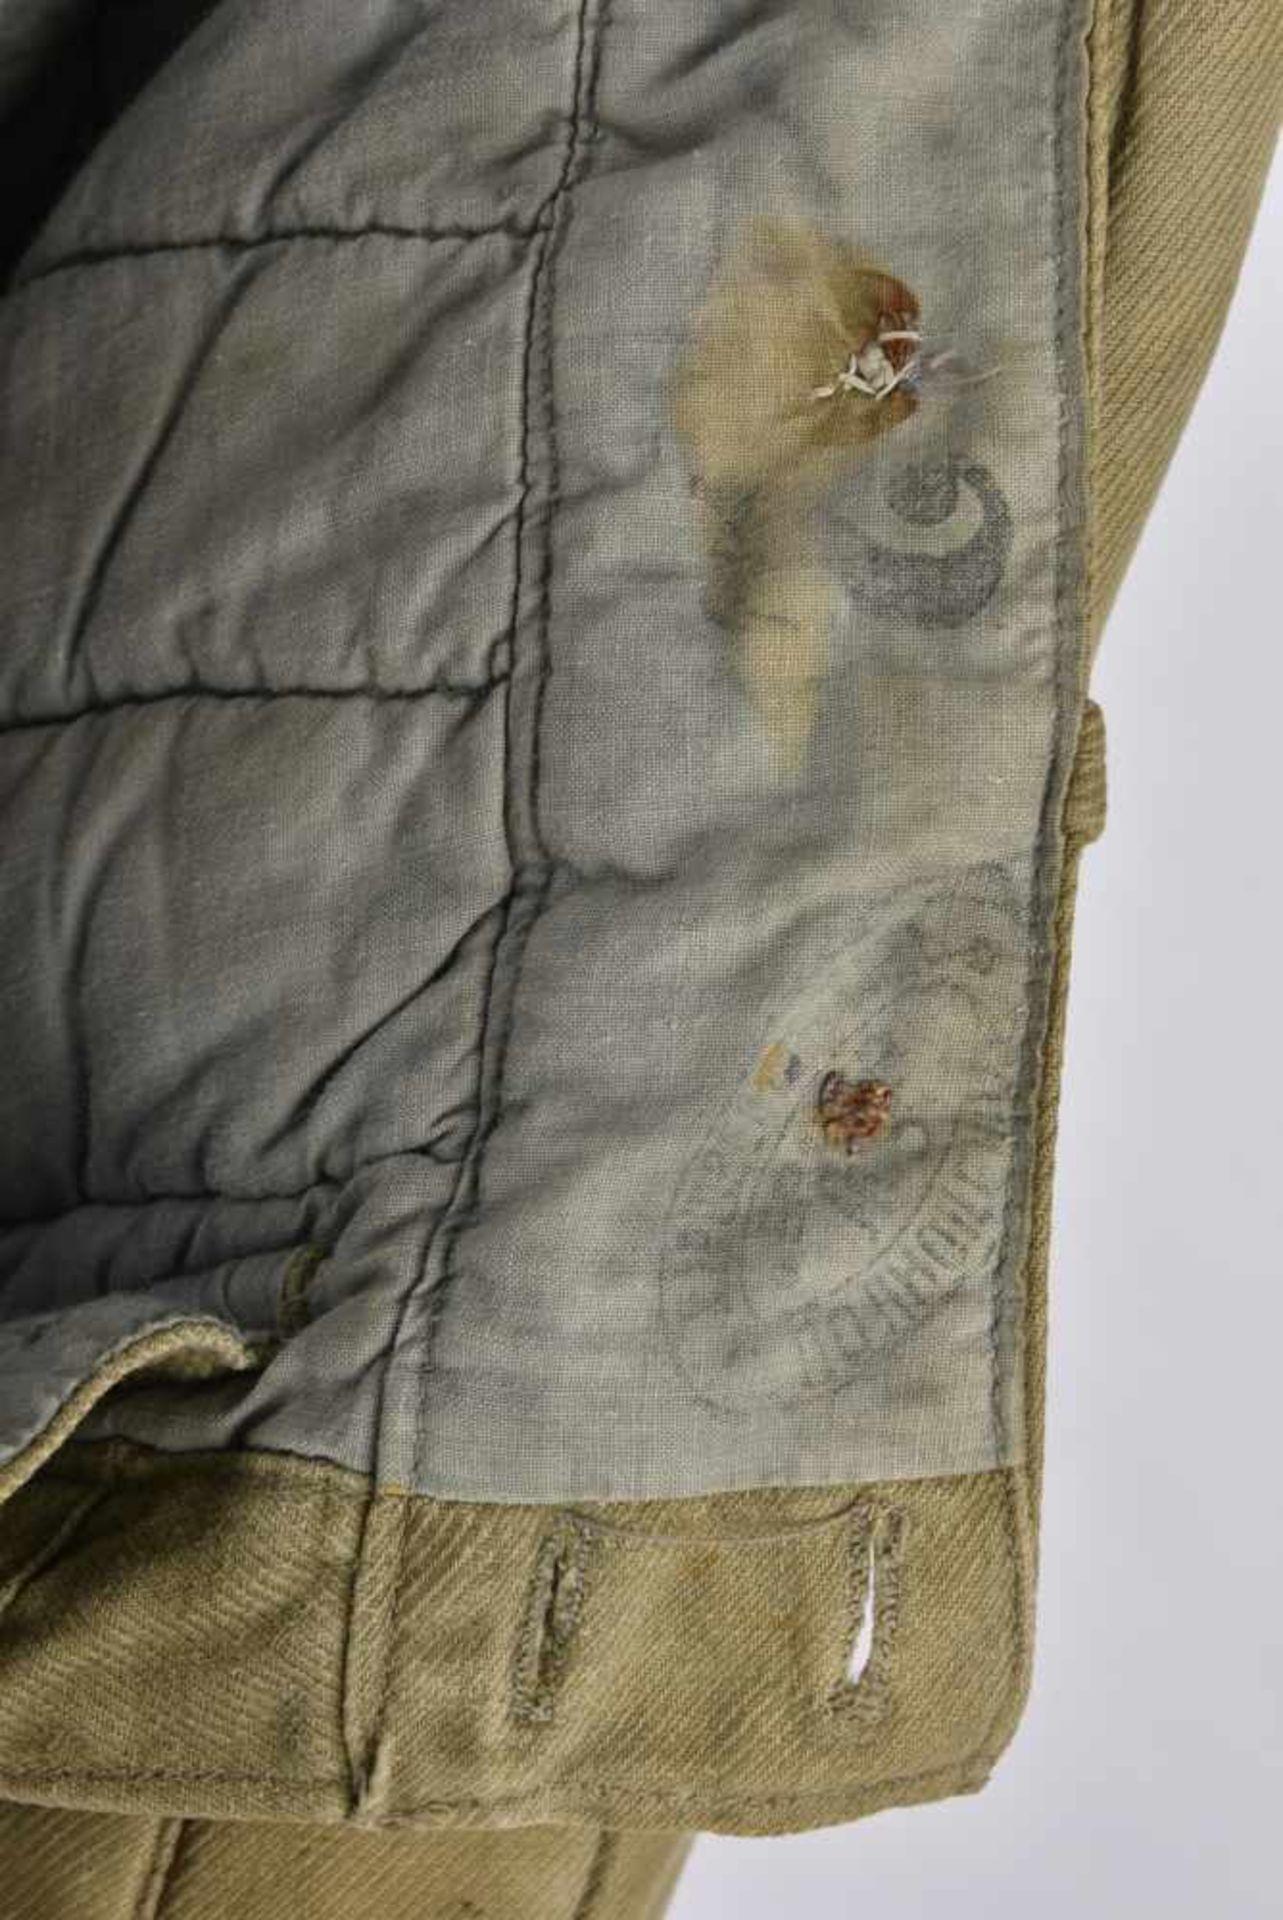 Ensemble matelassé comprenant la veste Telogreyka et le pantalon Ensemble homogène trouvé en - Bild 3 aus 4